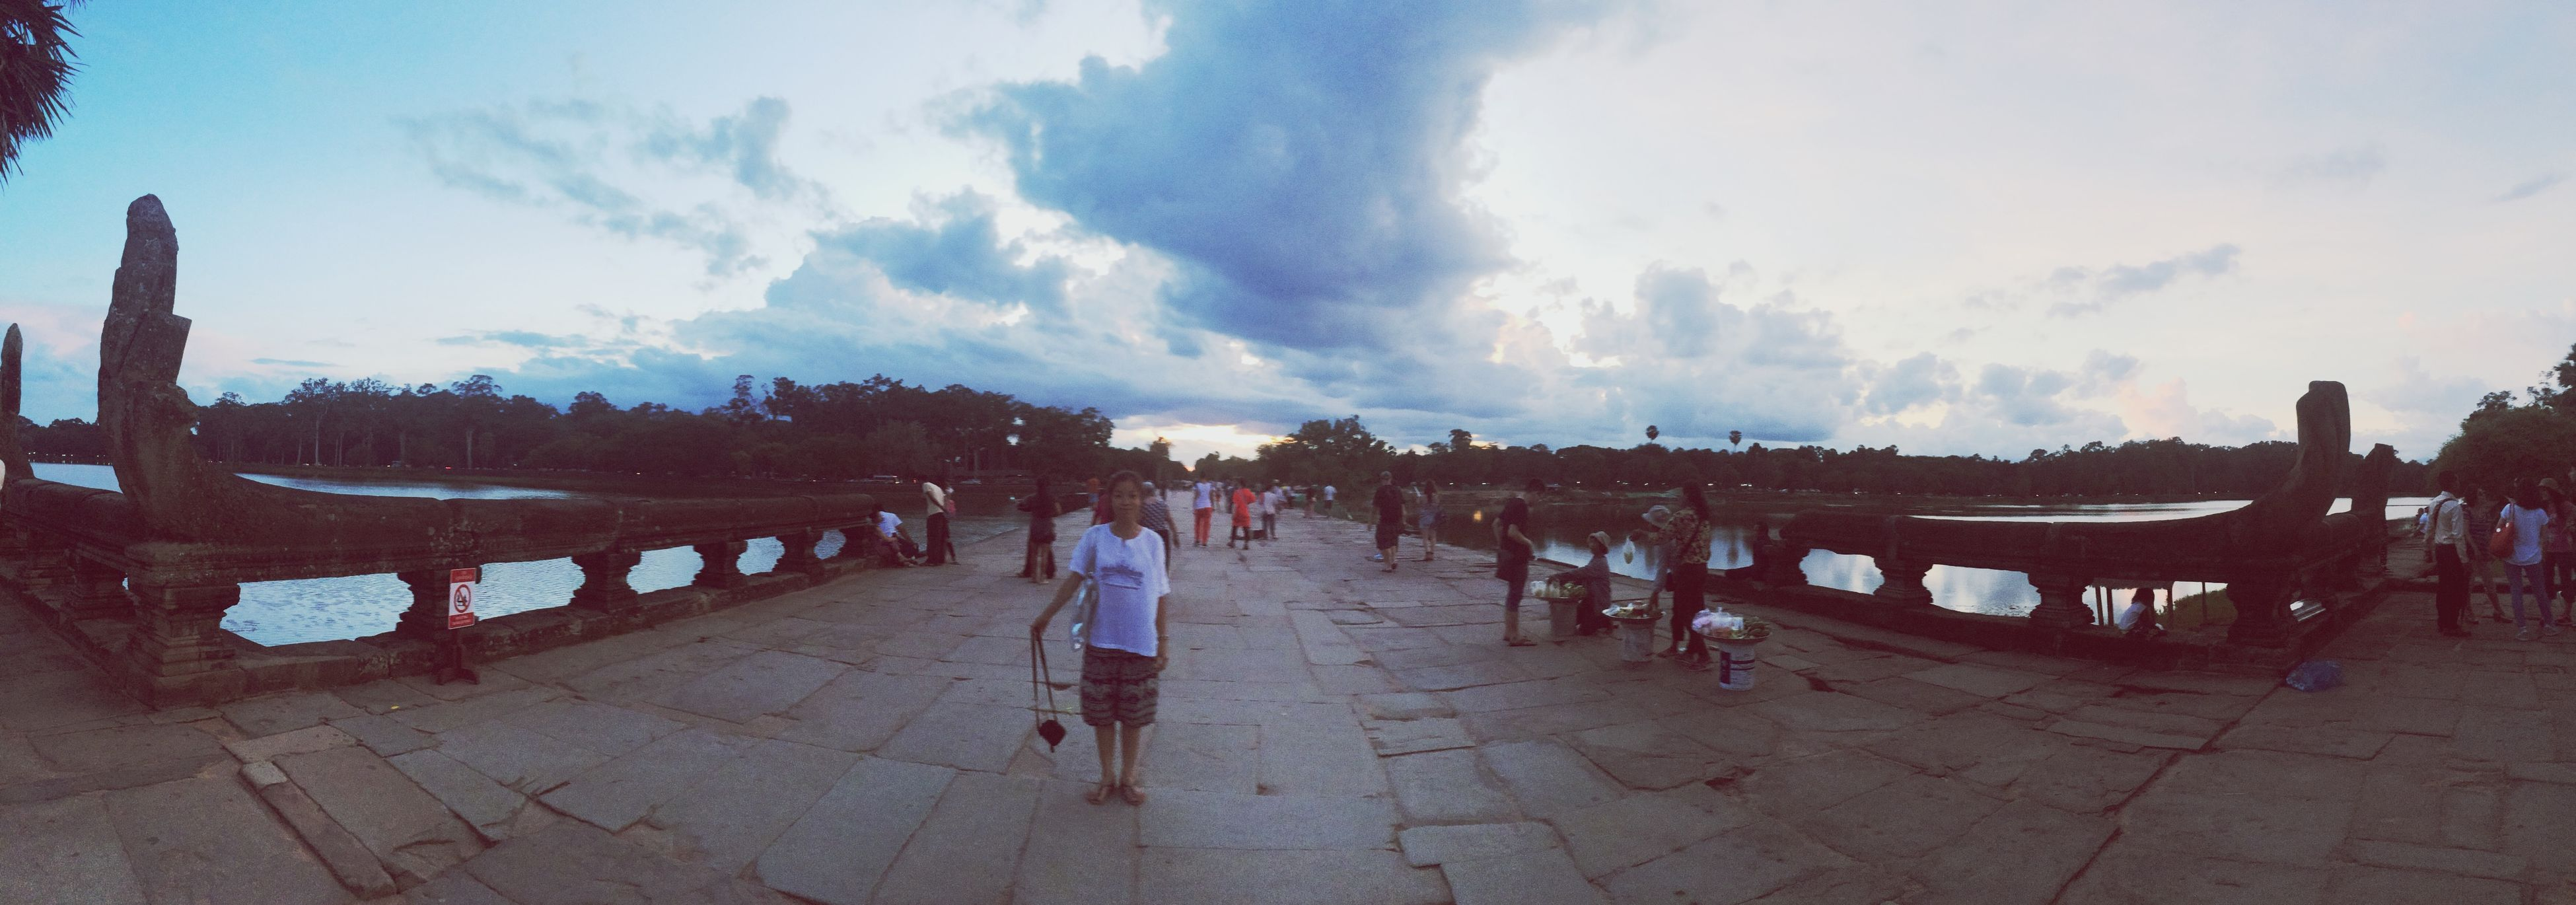 Thekingdomofwonder Cambodia Angkor Wat